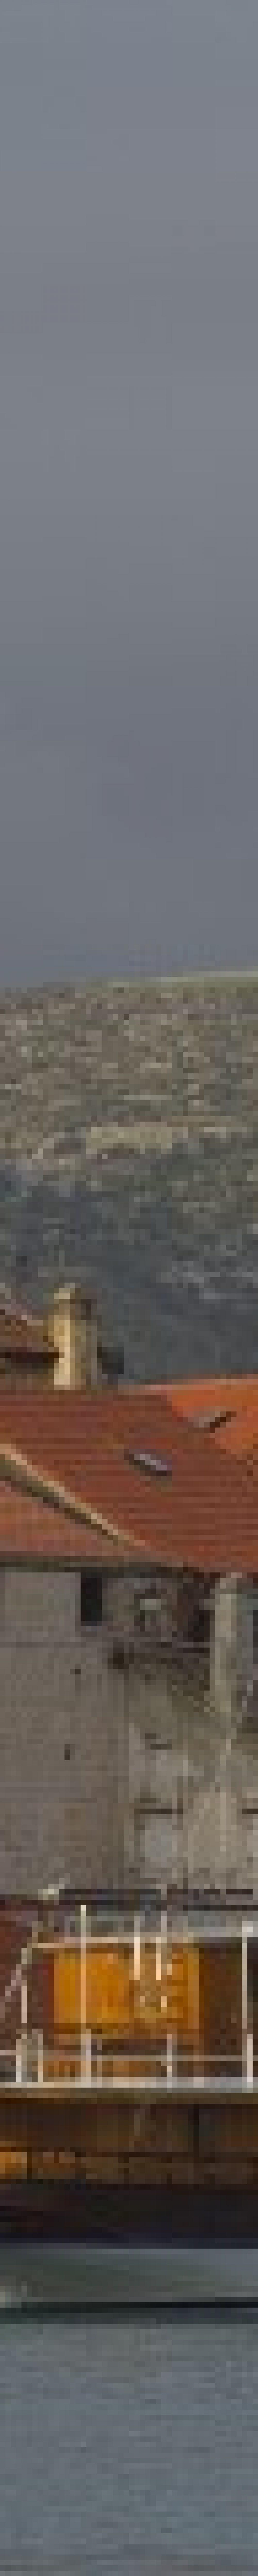 Trogir tourist destination